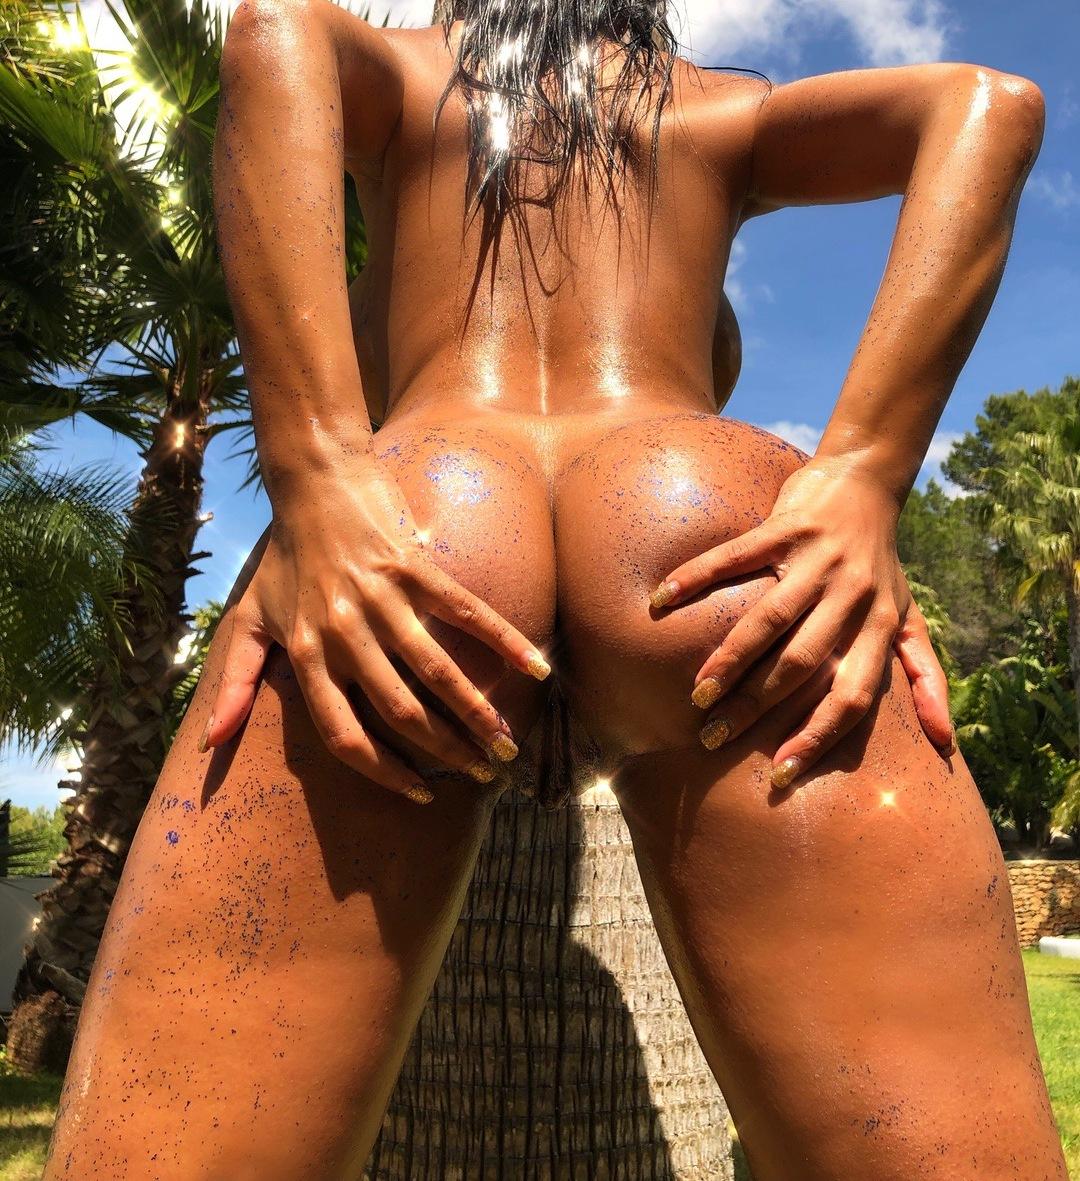 Ashton Avenue Ashtonavenue Onlyfans Nudes Leaks 0017